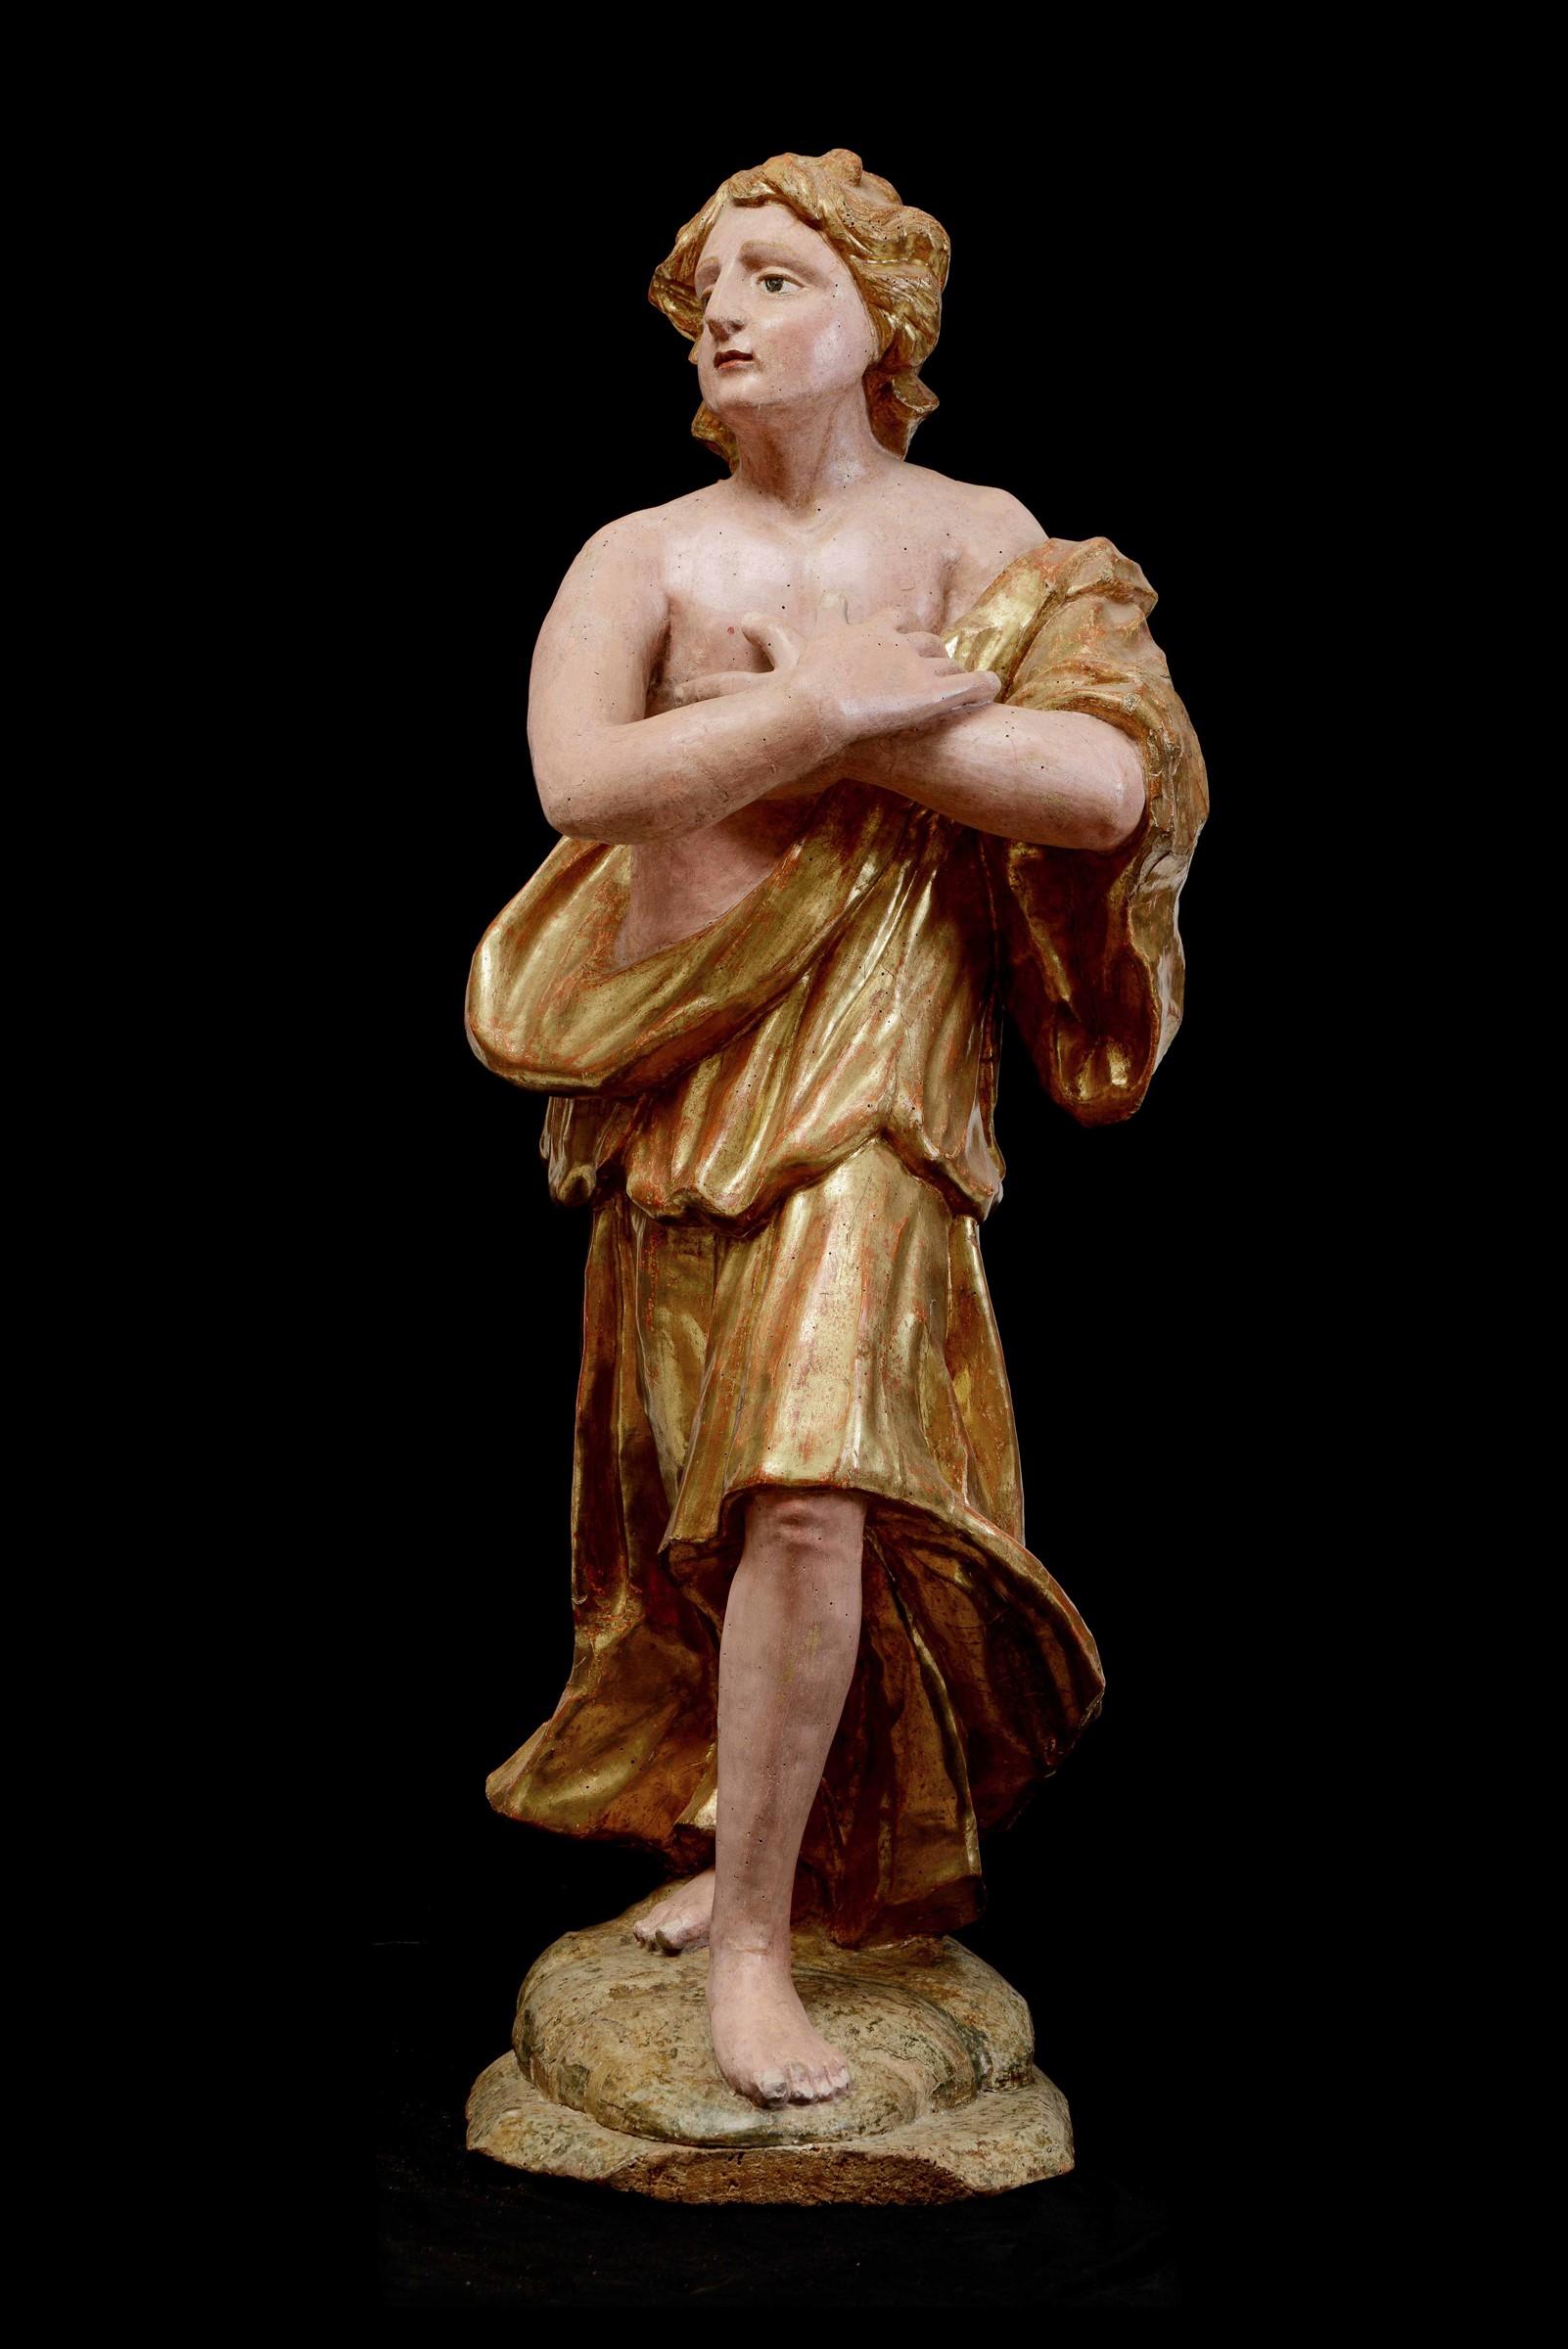 A wooden sculpture, Central Italy, 16-1700s - cm 120 (restauri alla policromia) - - Image 2 of 2